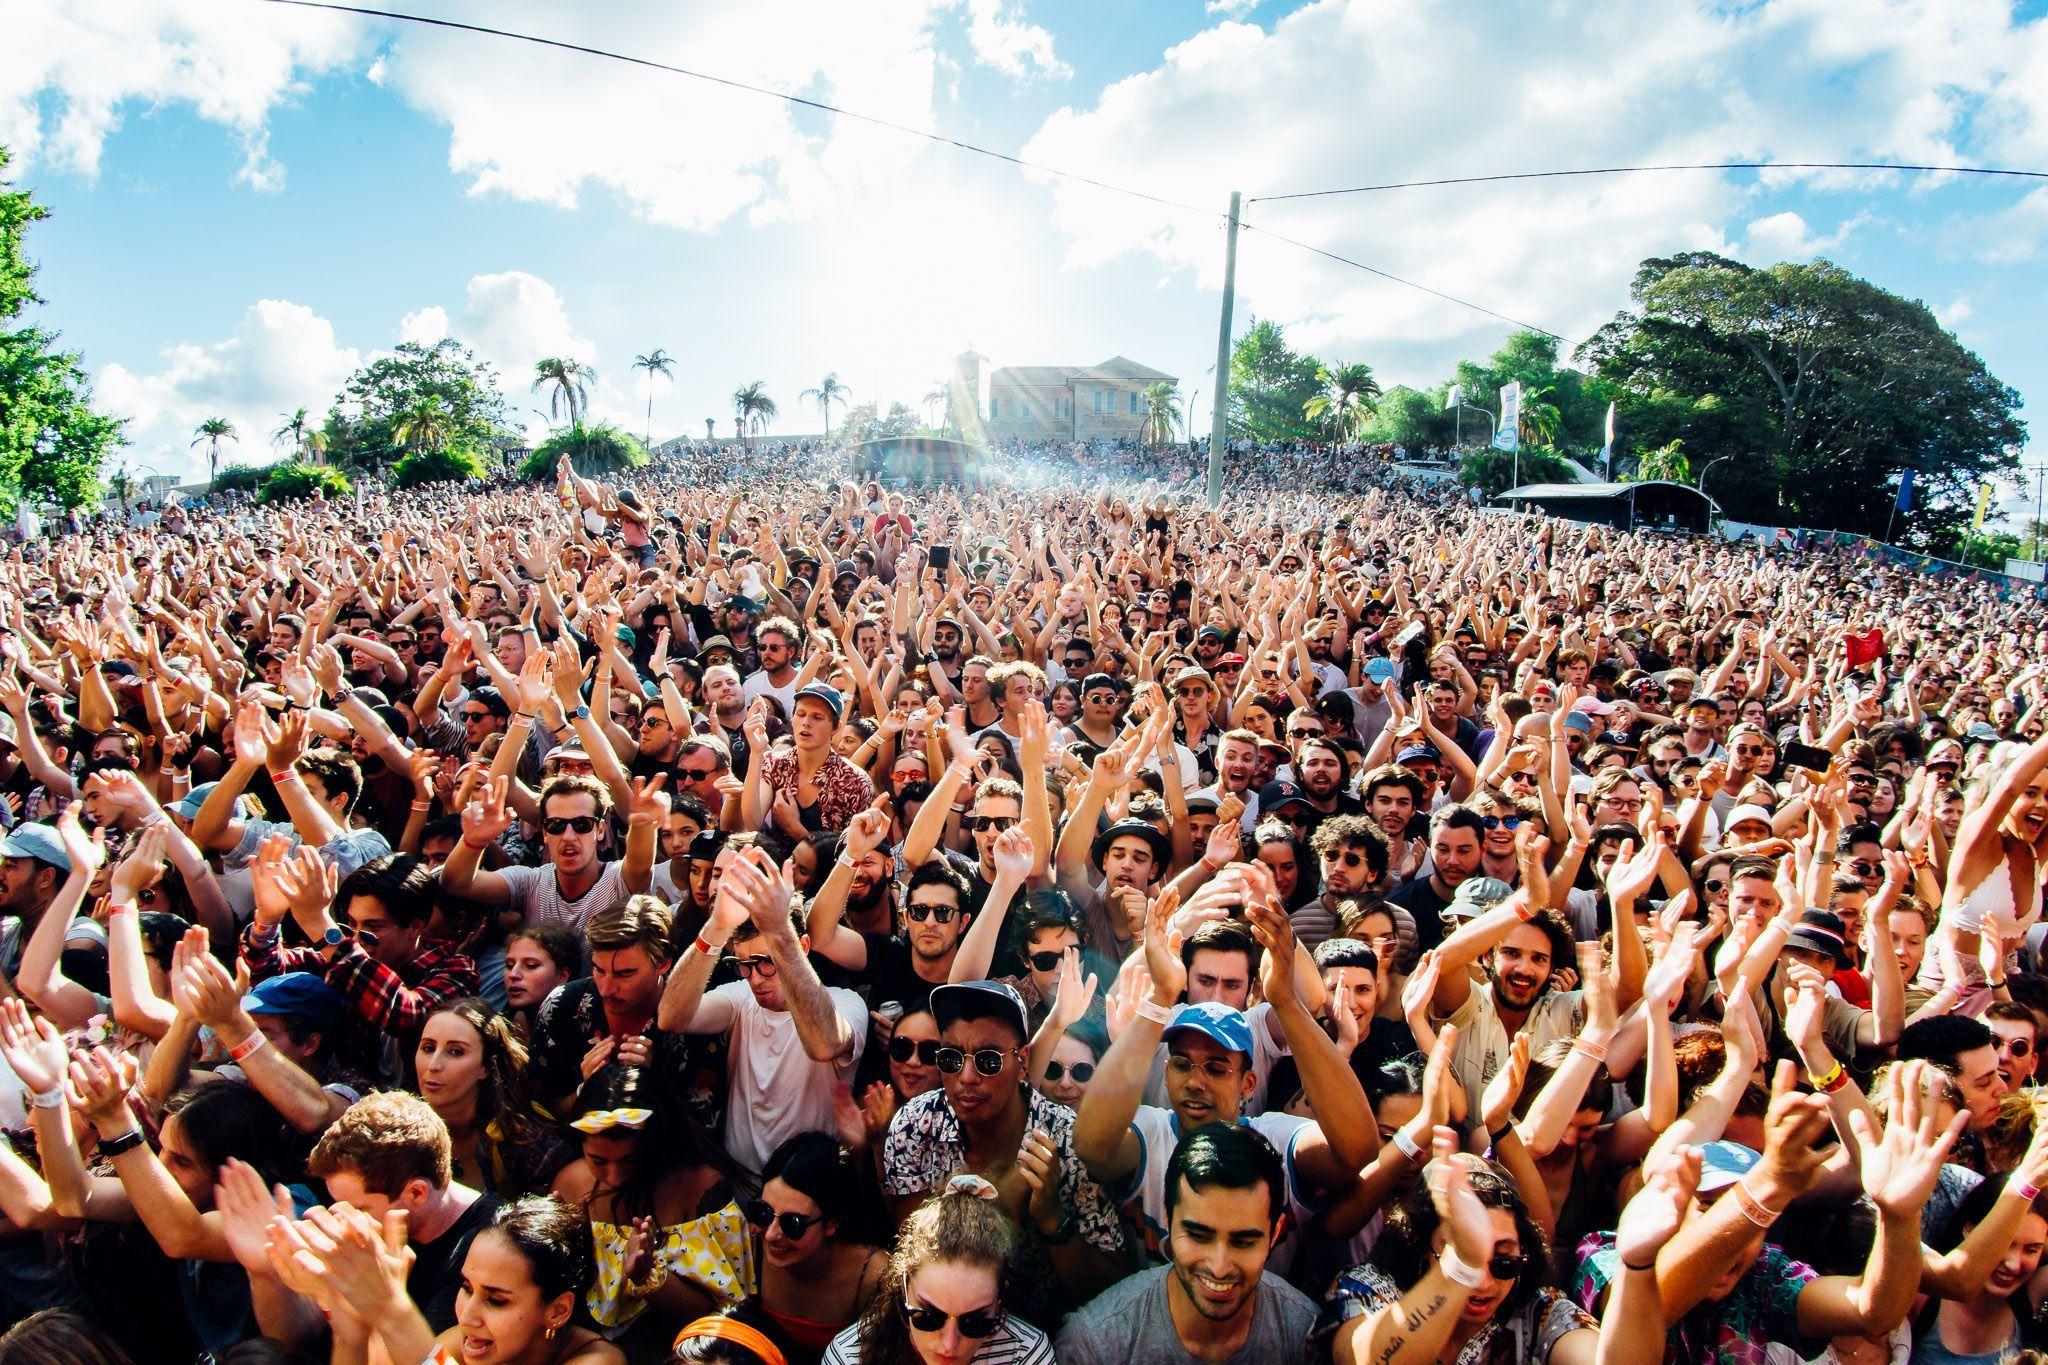 St. Jeromes Festival Auckland - NZ Festivals 2019